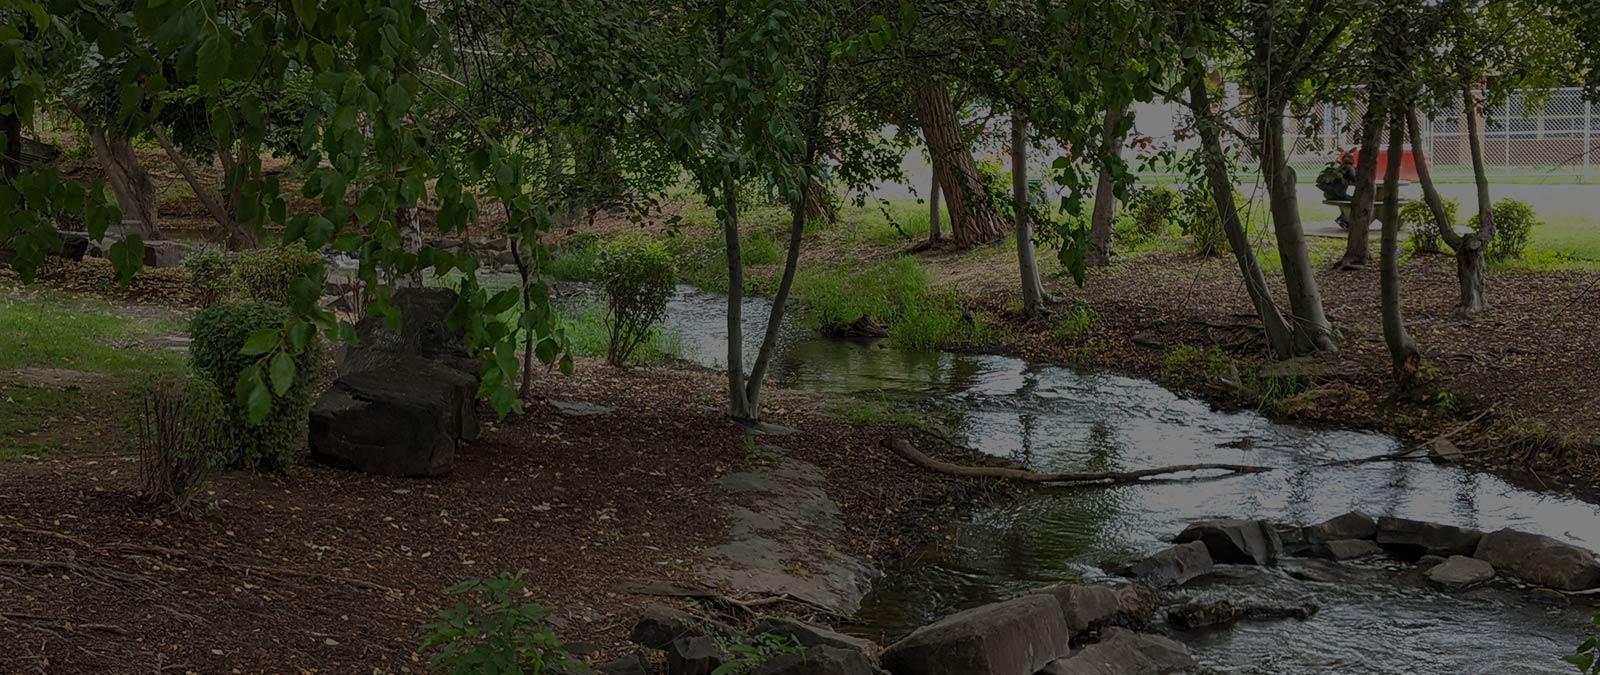 images/slideshow/creek.jpg